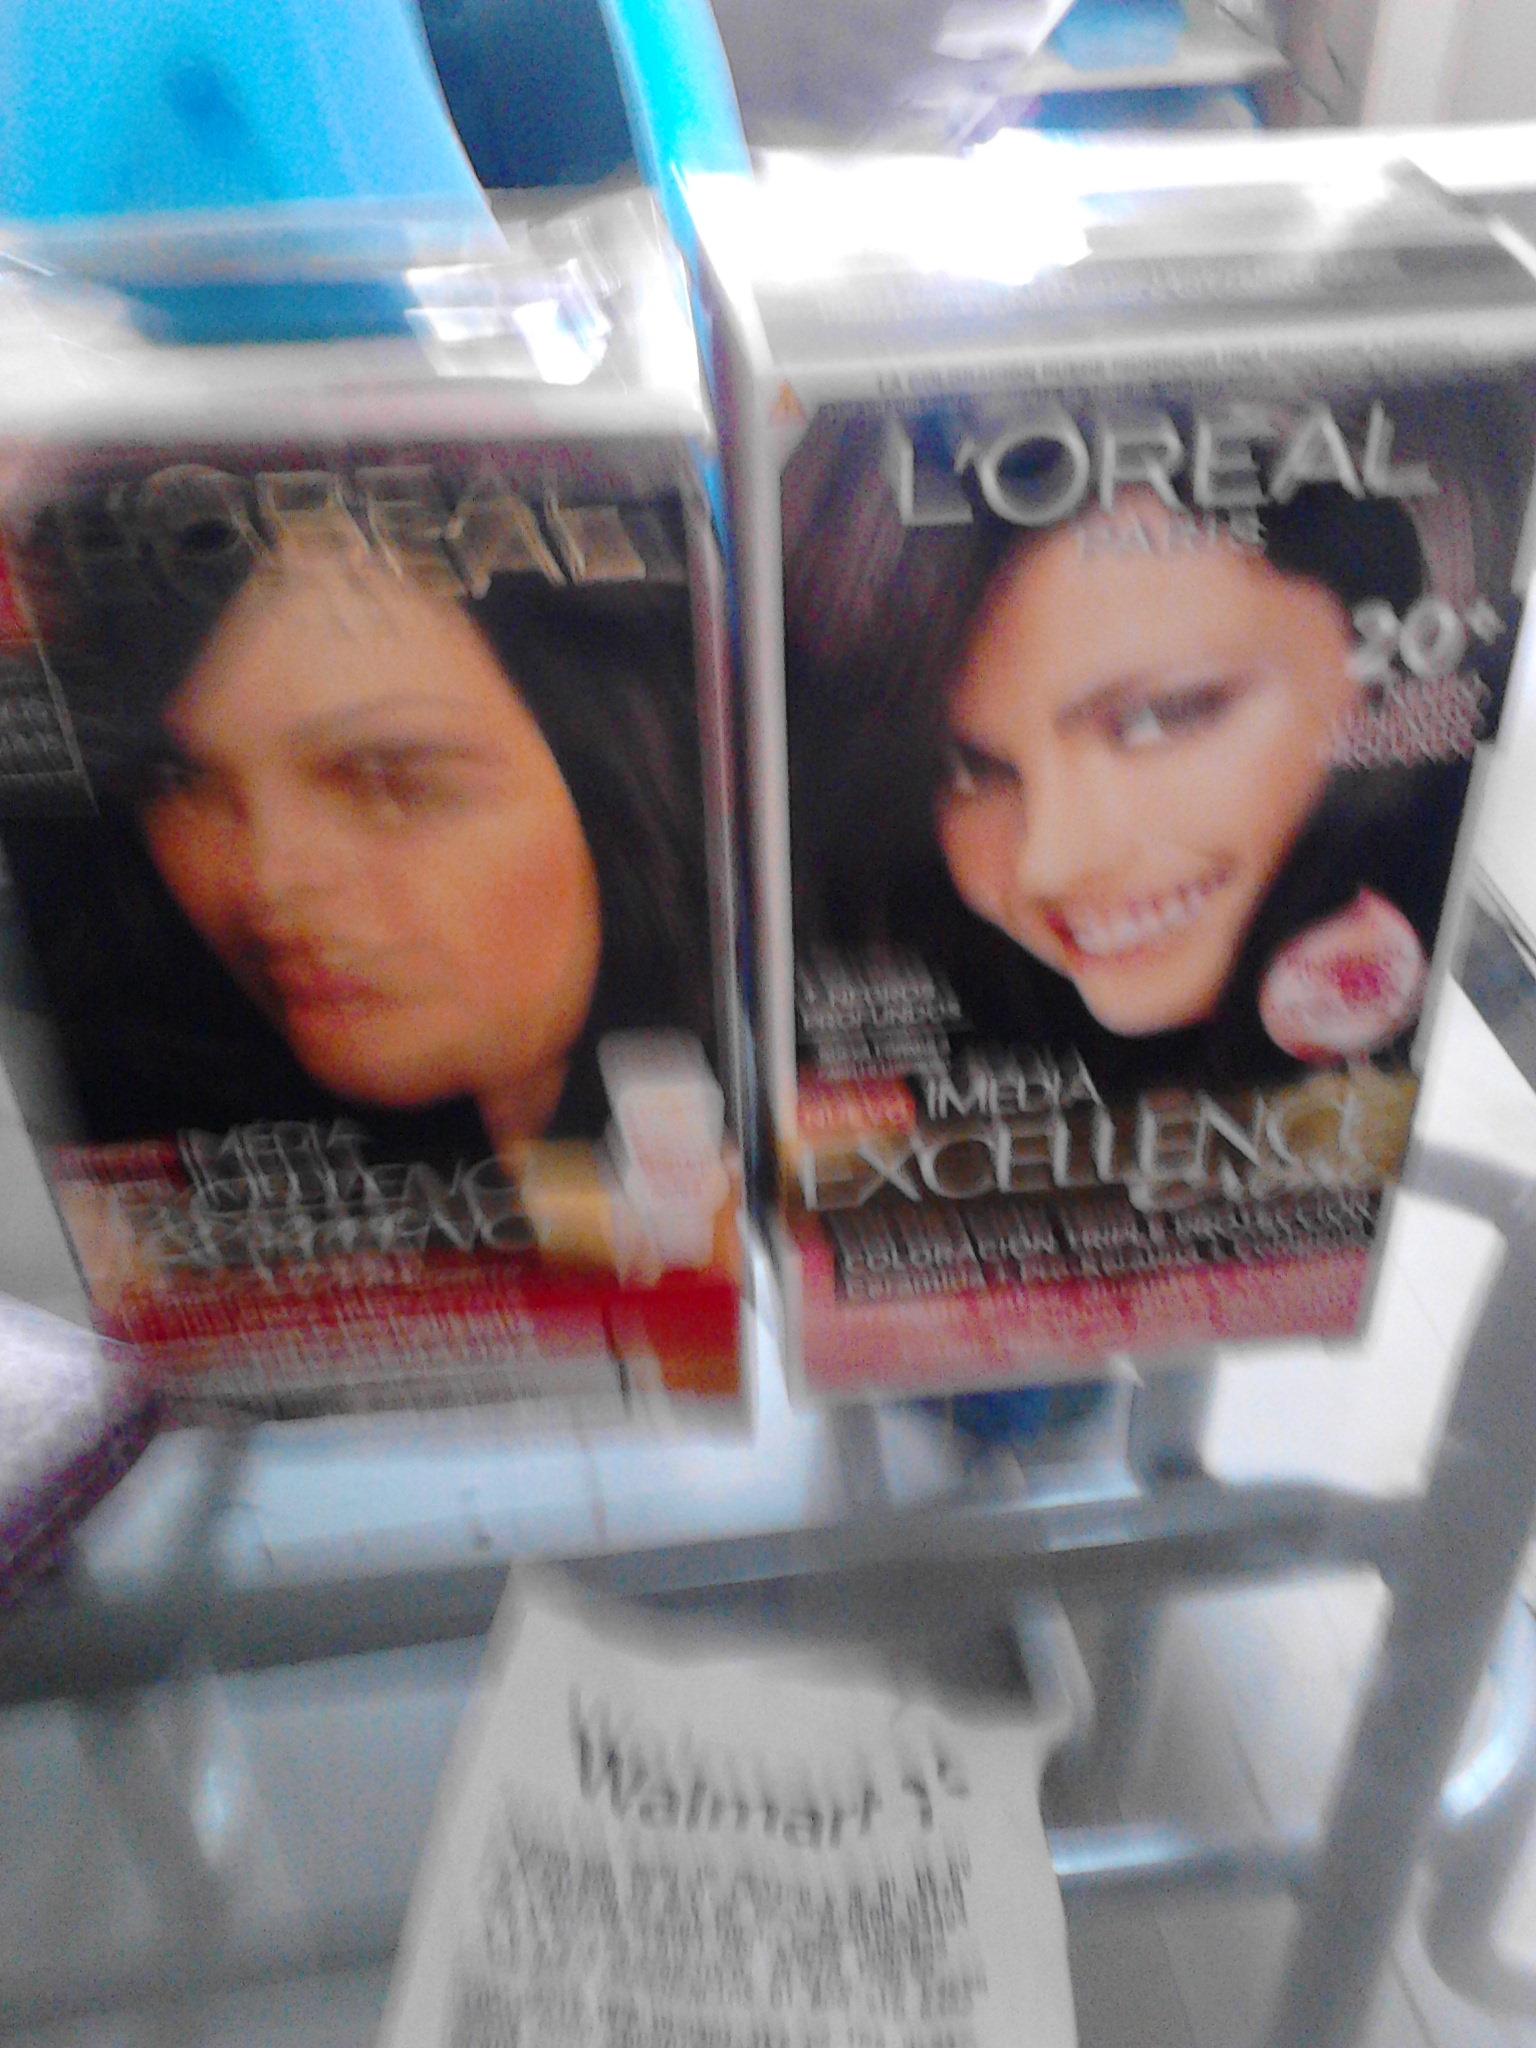 Walmart La Cañada: tinte L'Oréal excellence a $14